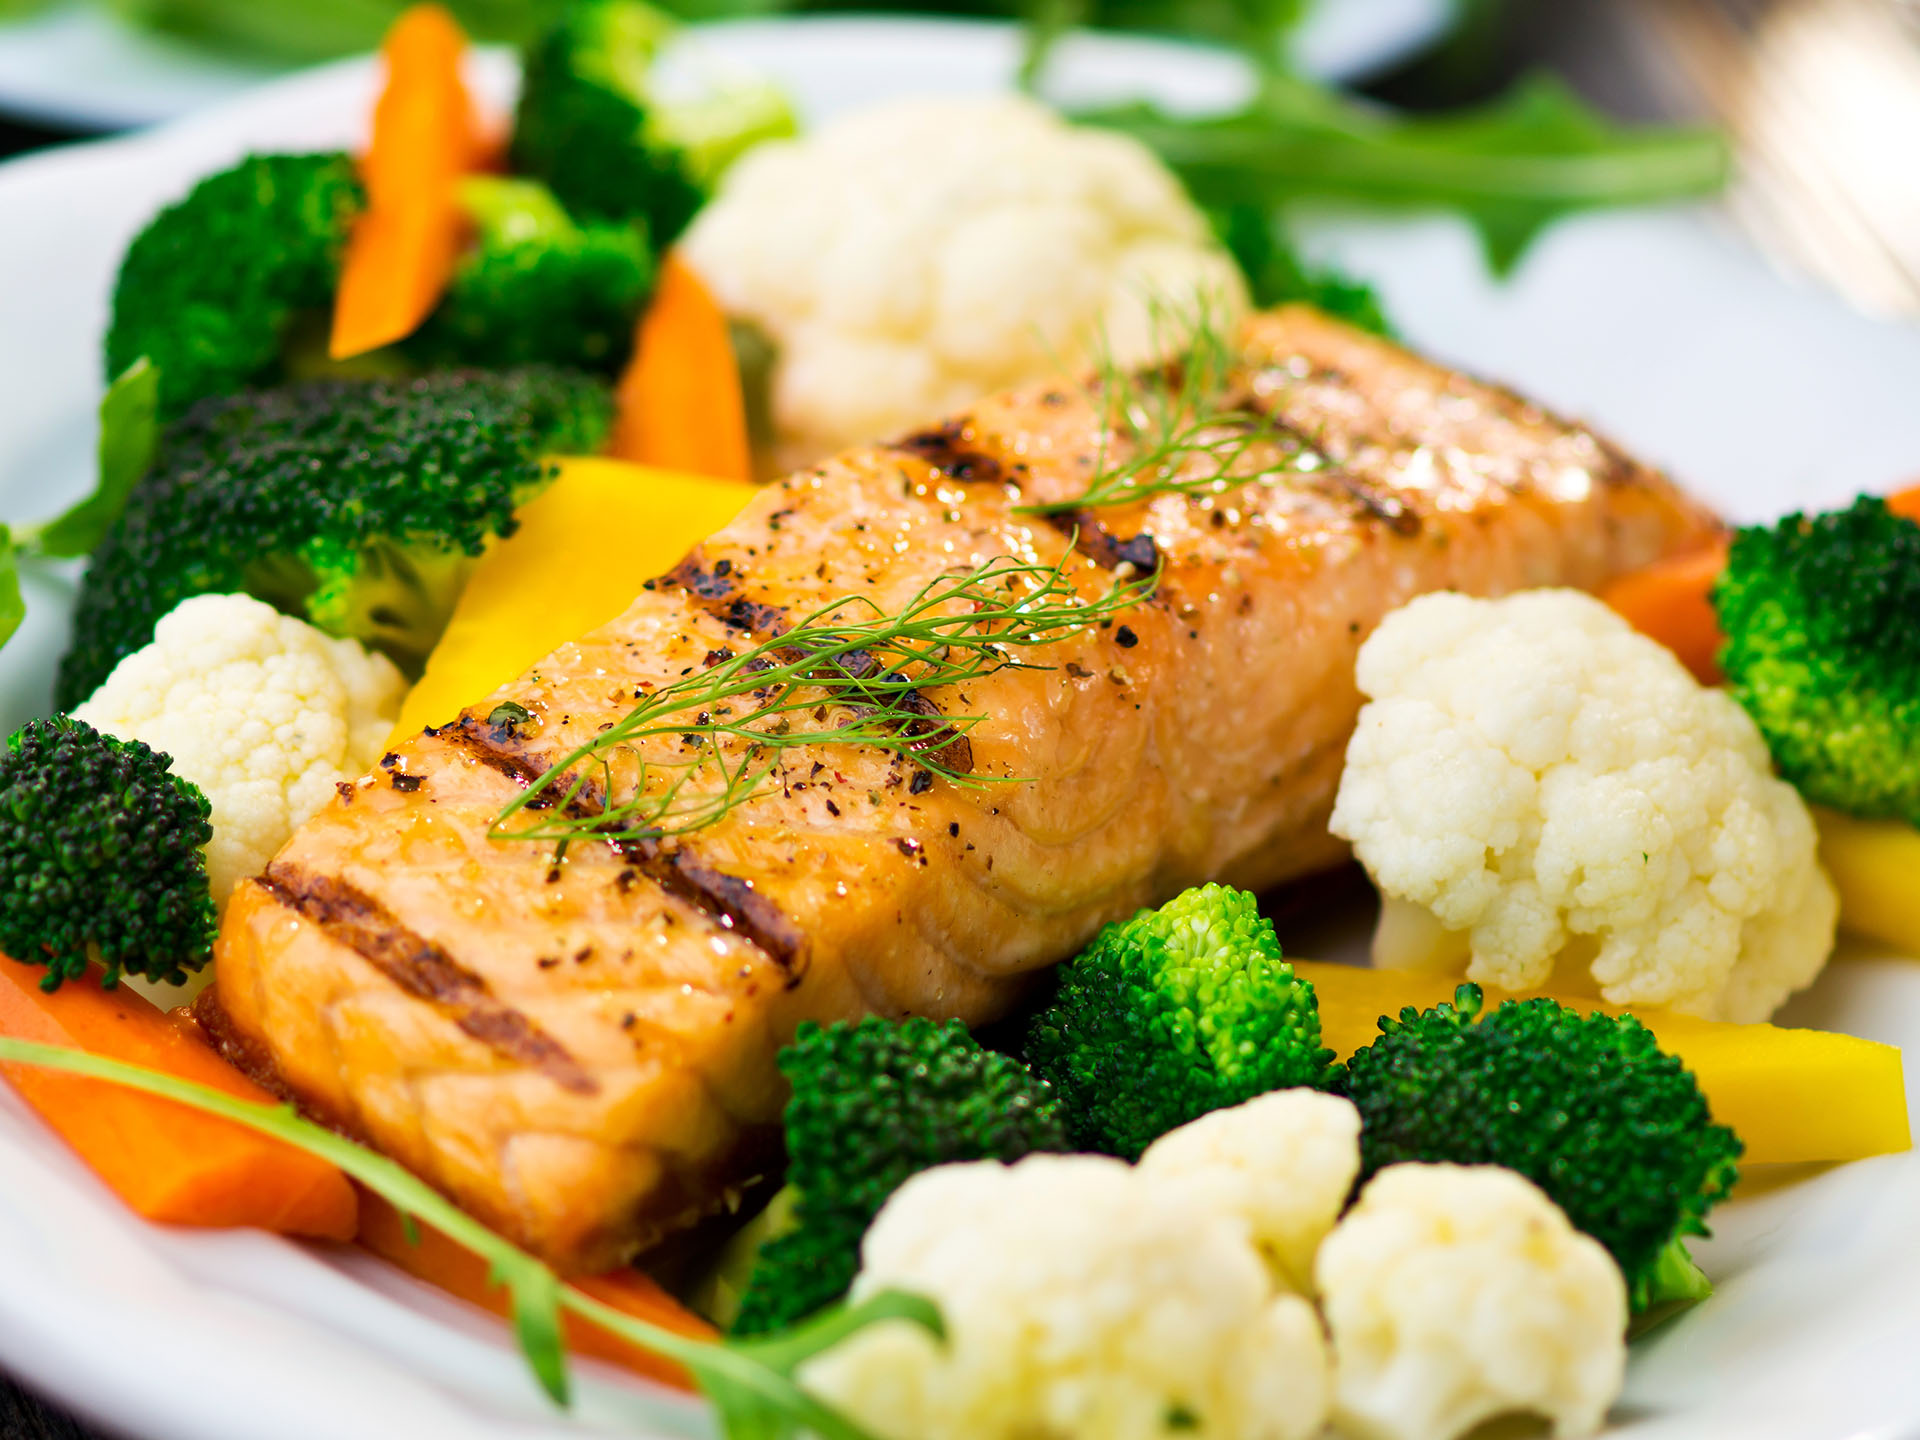 Top 7 Healthy Eating